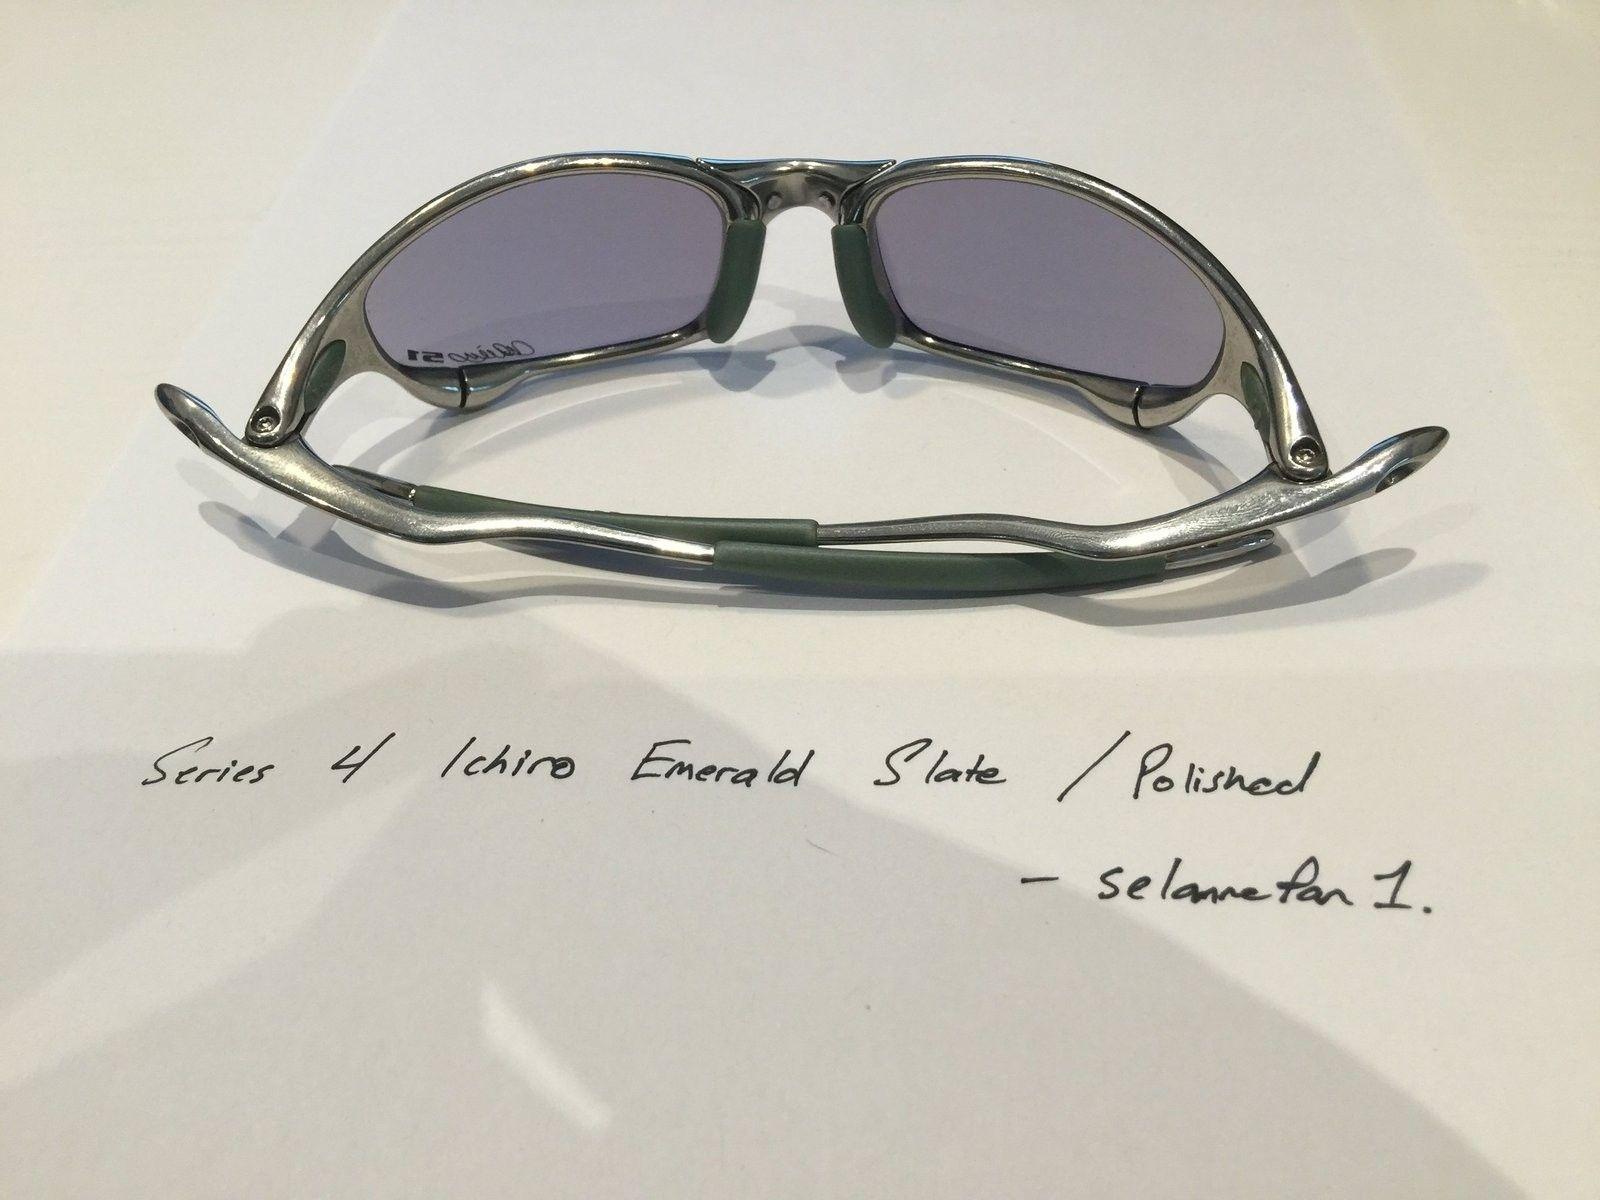 Ichiro Emerald Slate / Polished Frame Juliets (with box) - IMG_3820.JPG